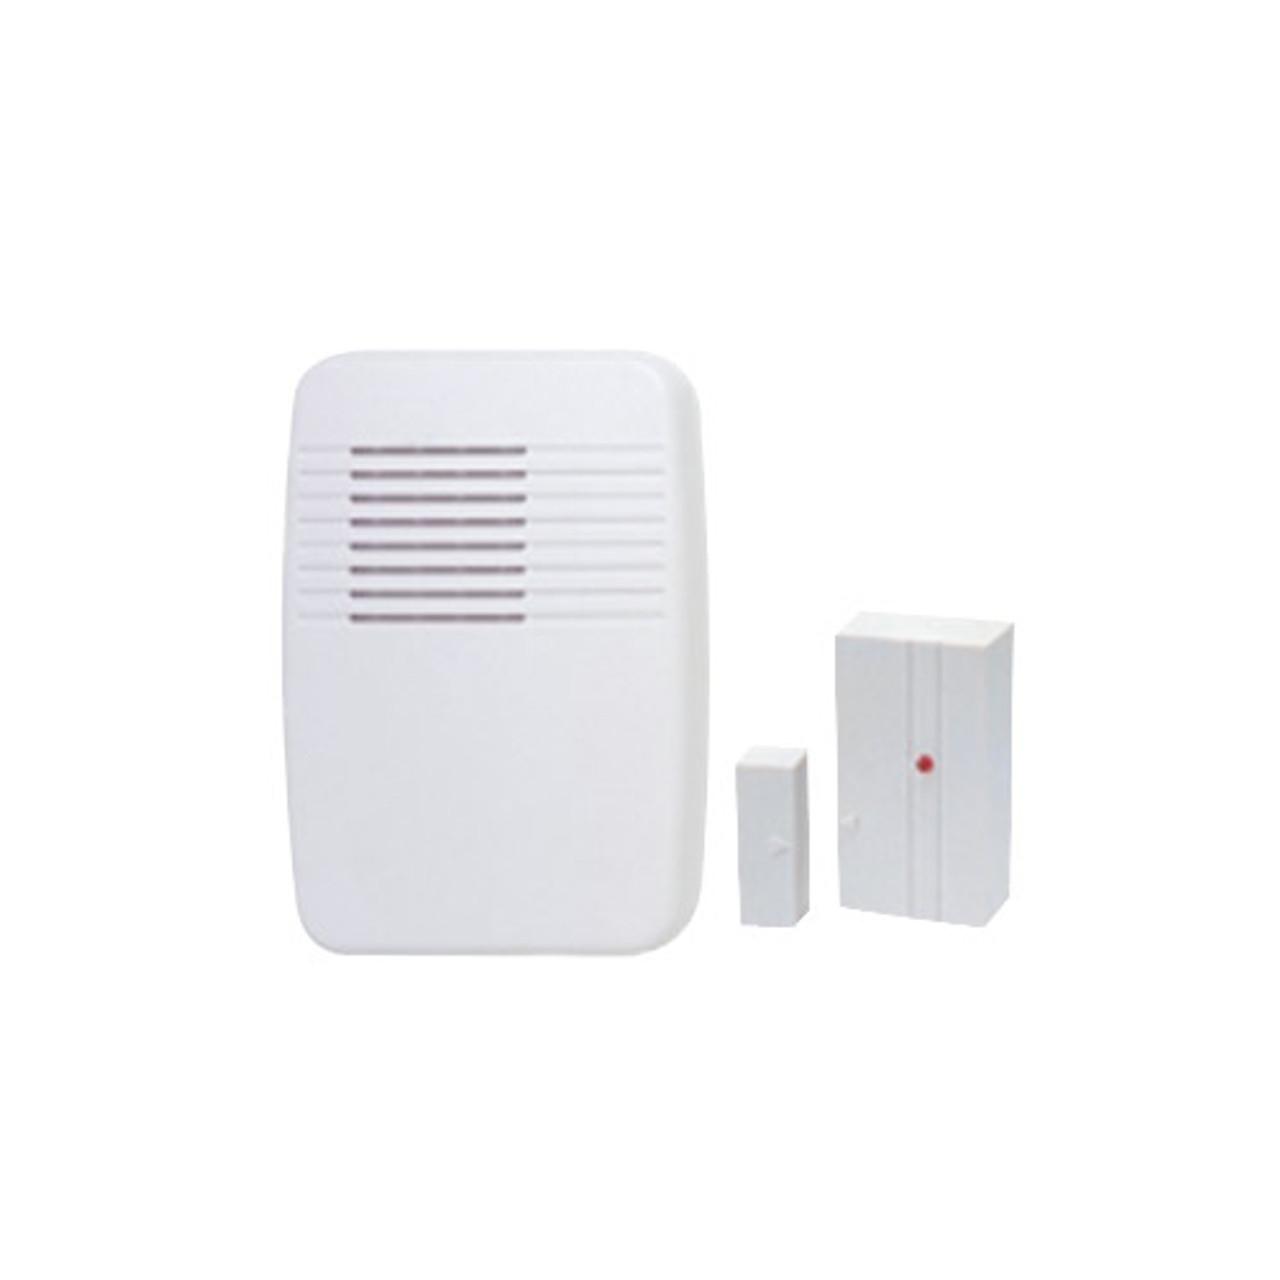 206-3 Trine Wireless Entry/Exit Signal Kit